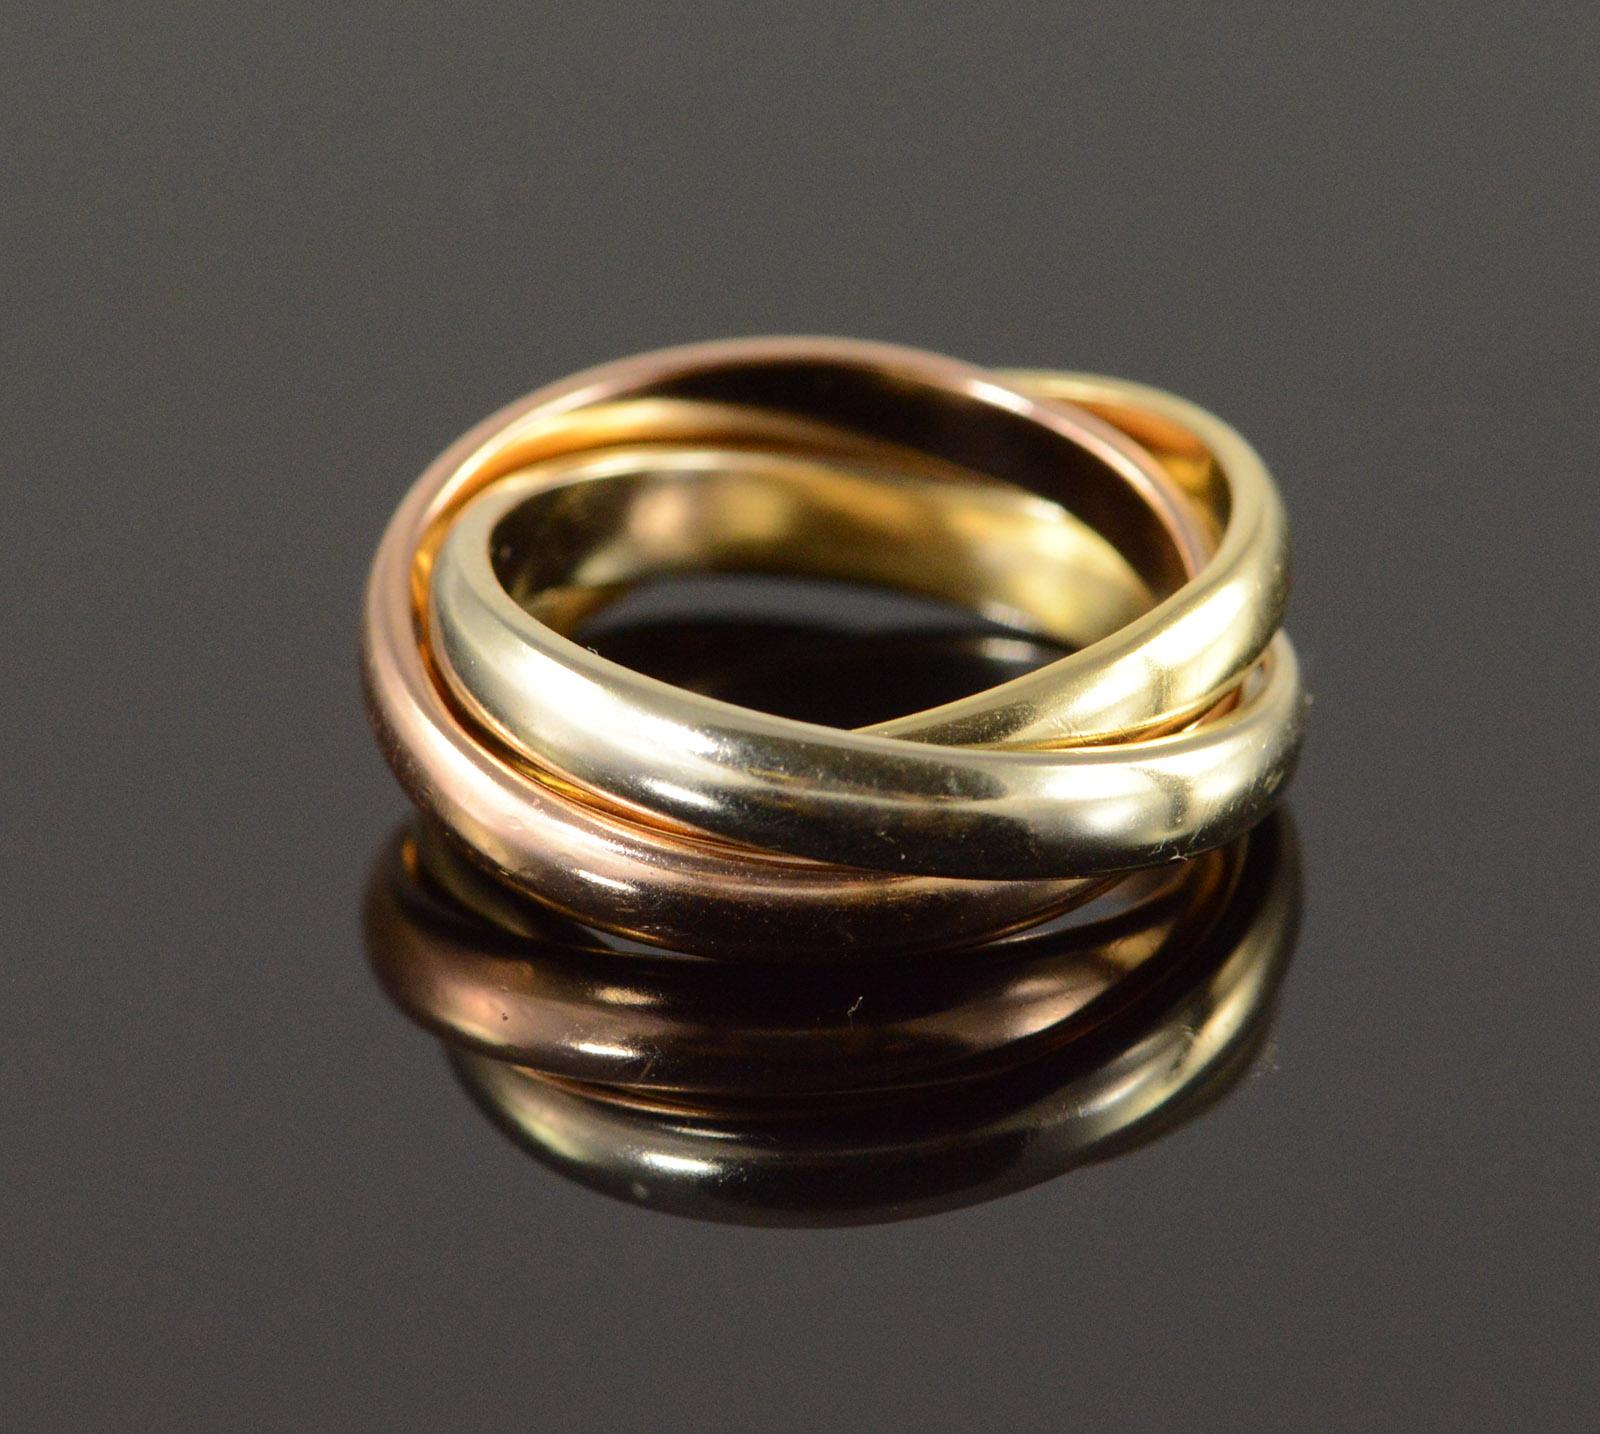 294b35a14 Image 1 of 4. 14K 6.3g Tri Color 3 Interlocking Wedding Band Yellow Gold ...